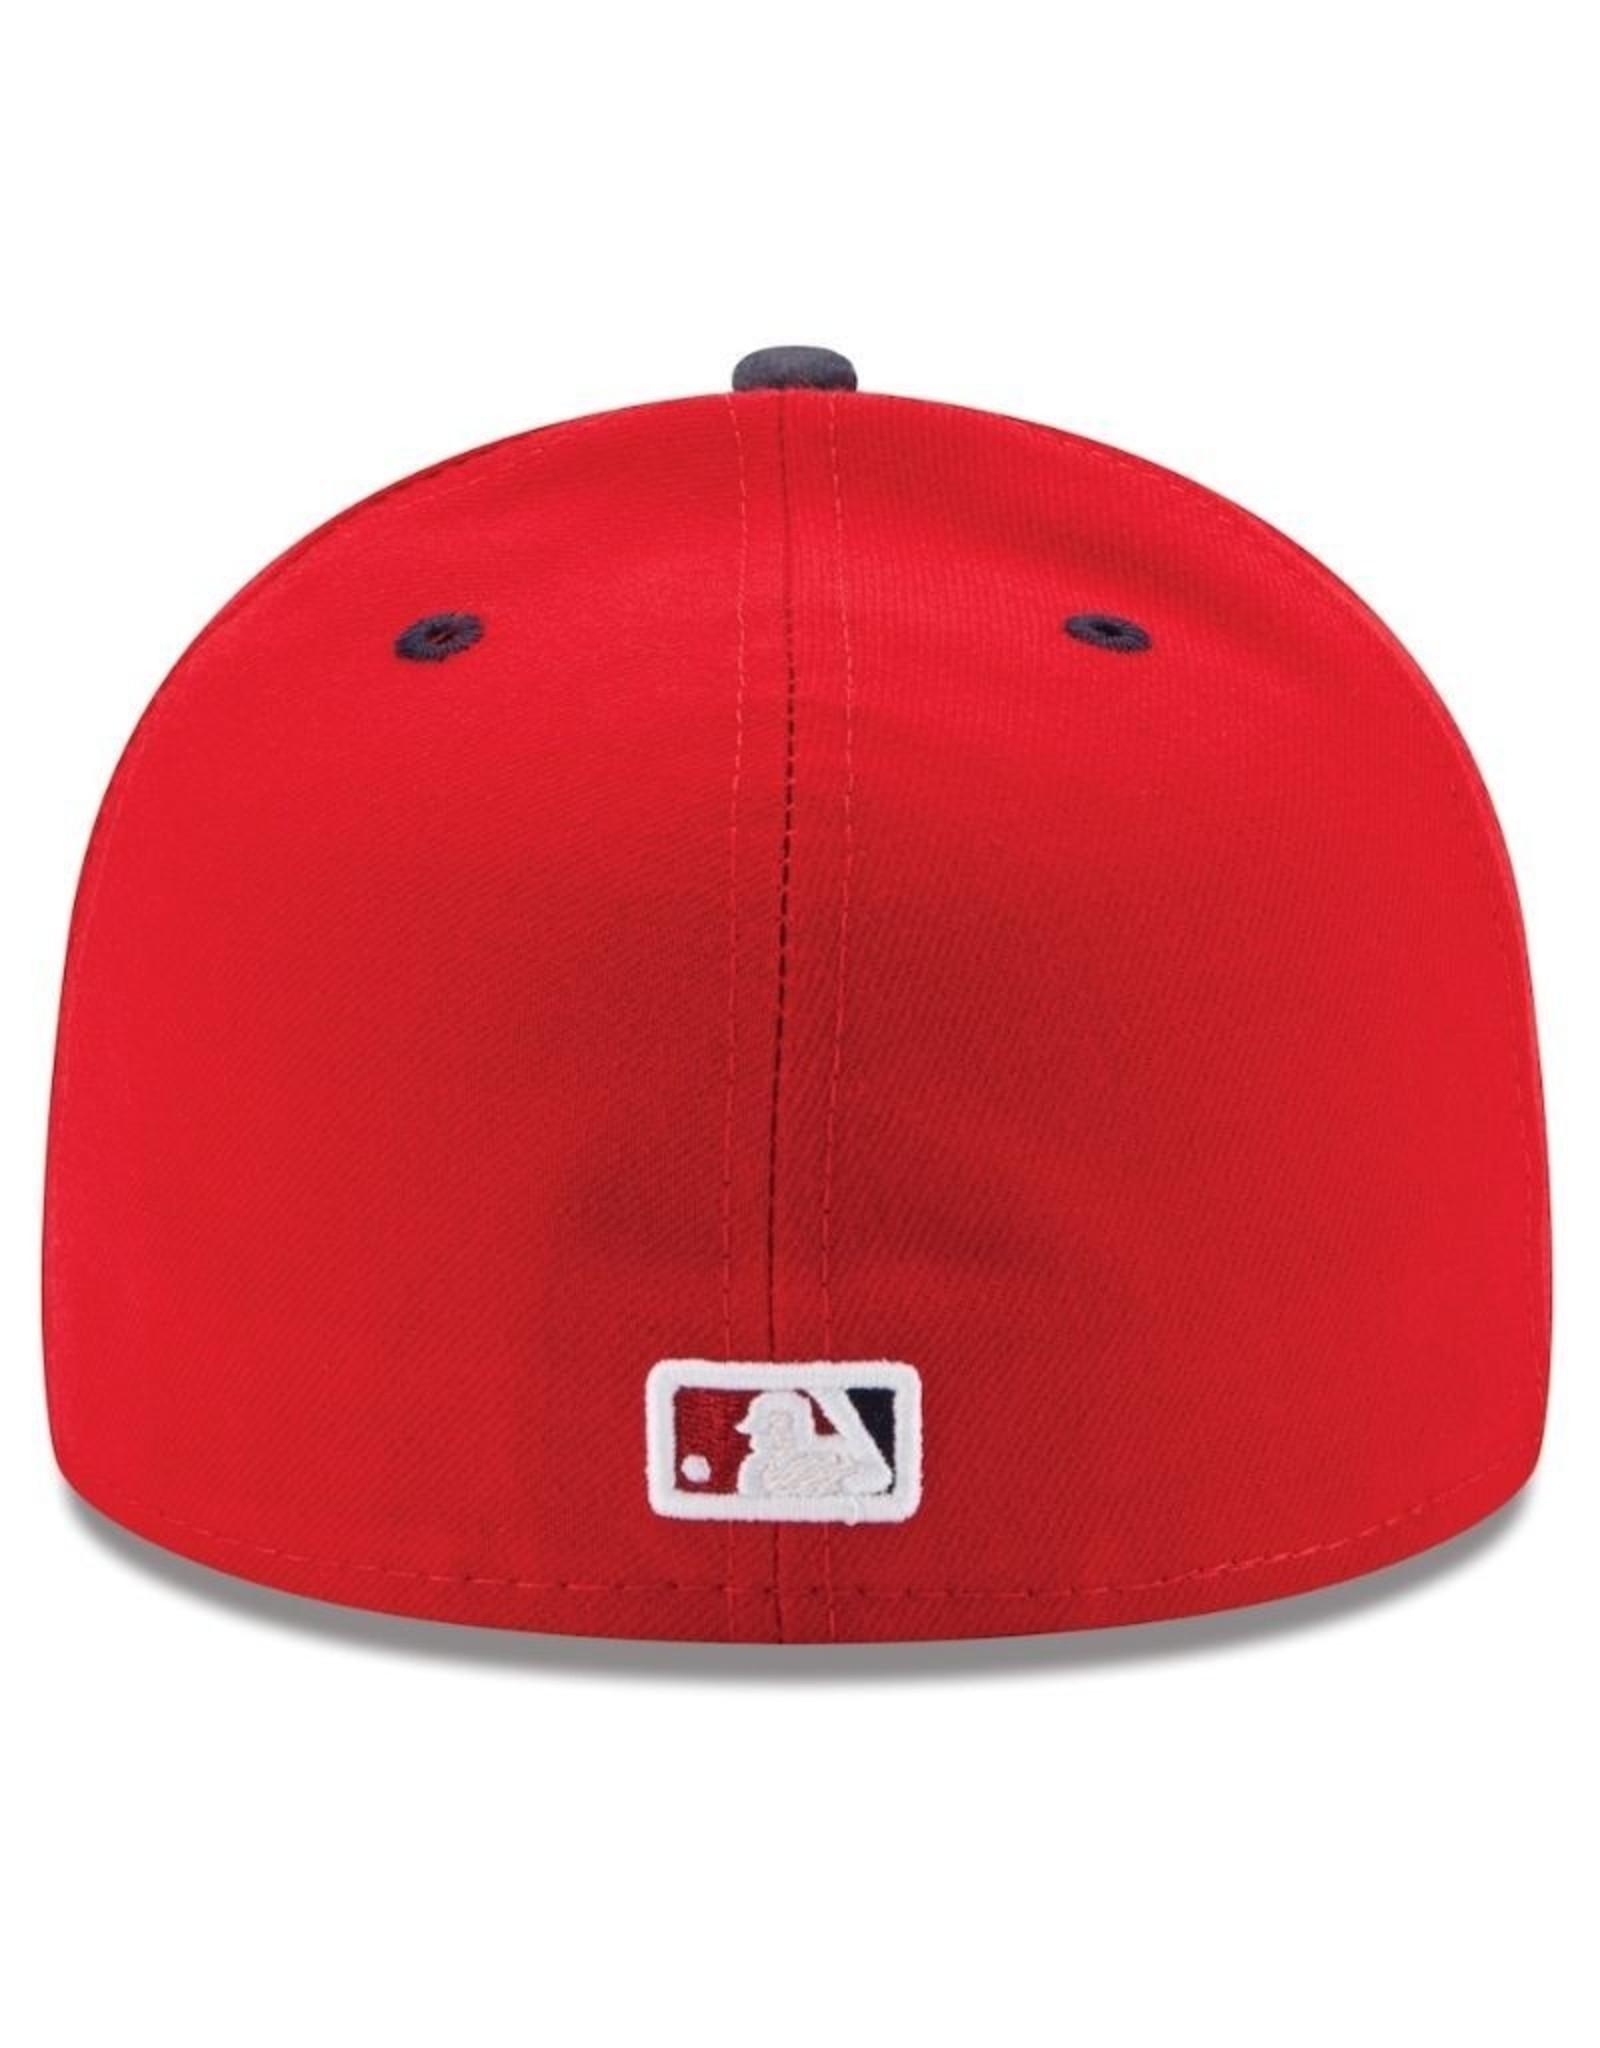 New Era On-Field Alternate 2 Hat Washington Nationals Red/Navy